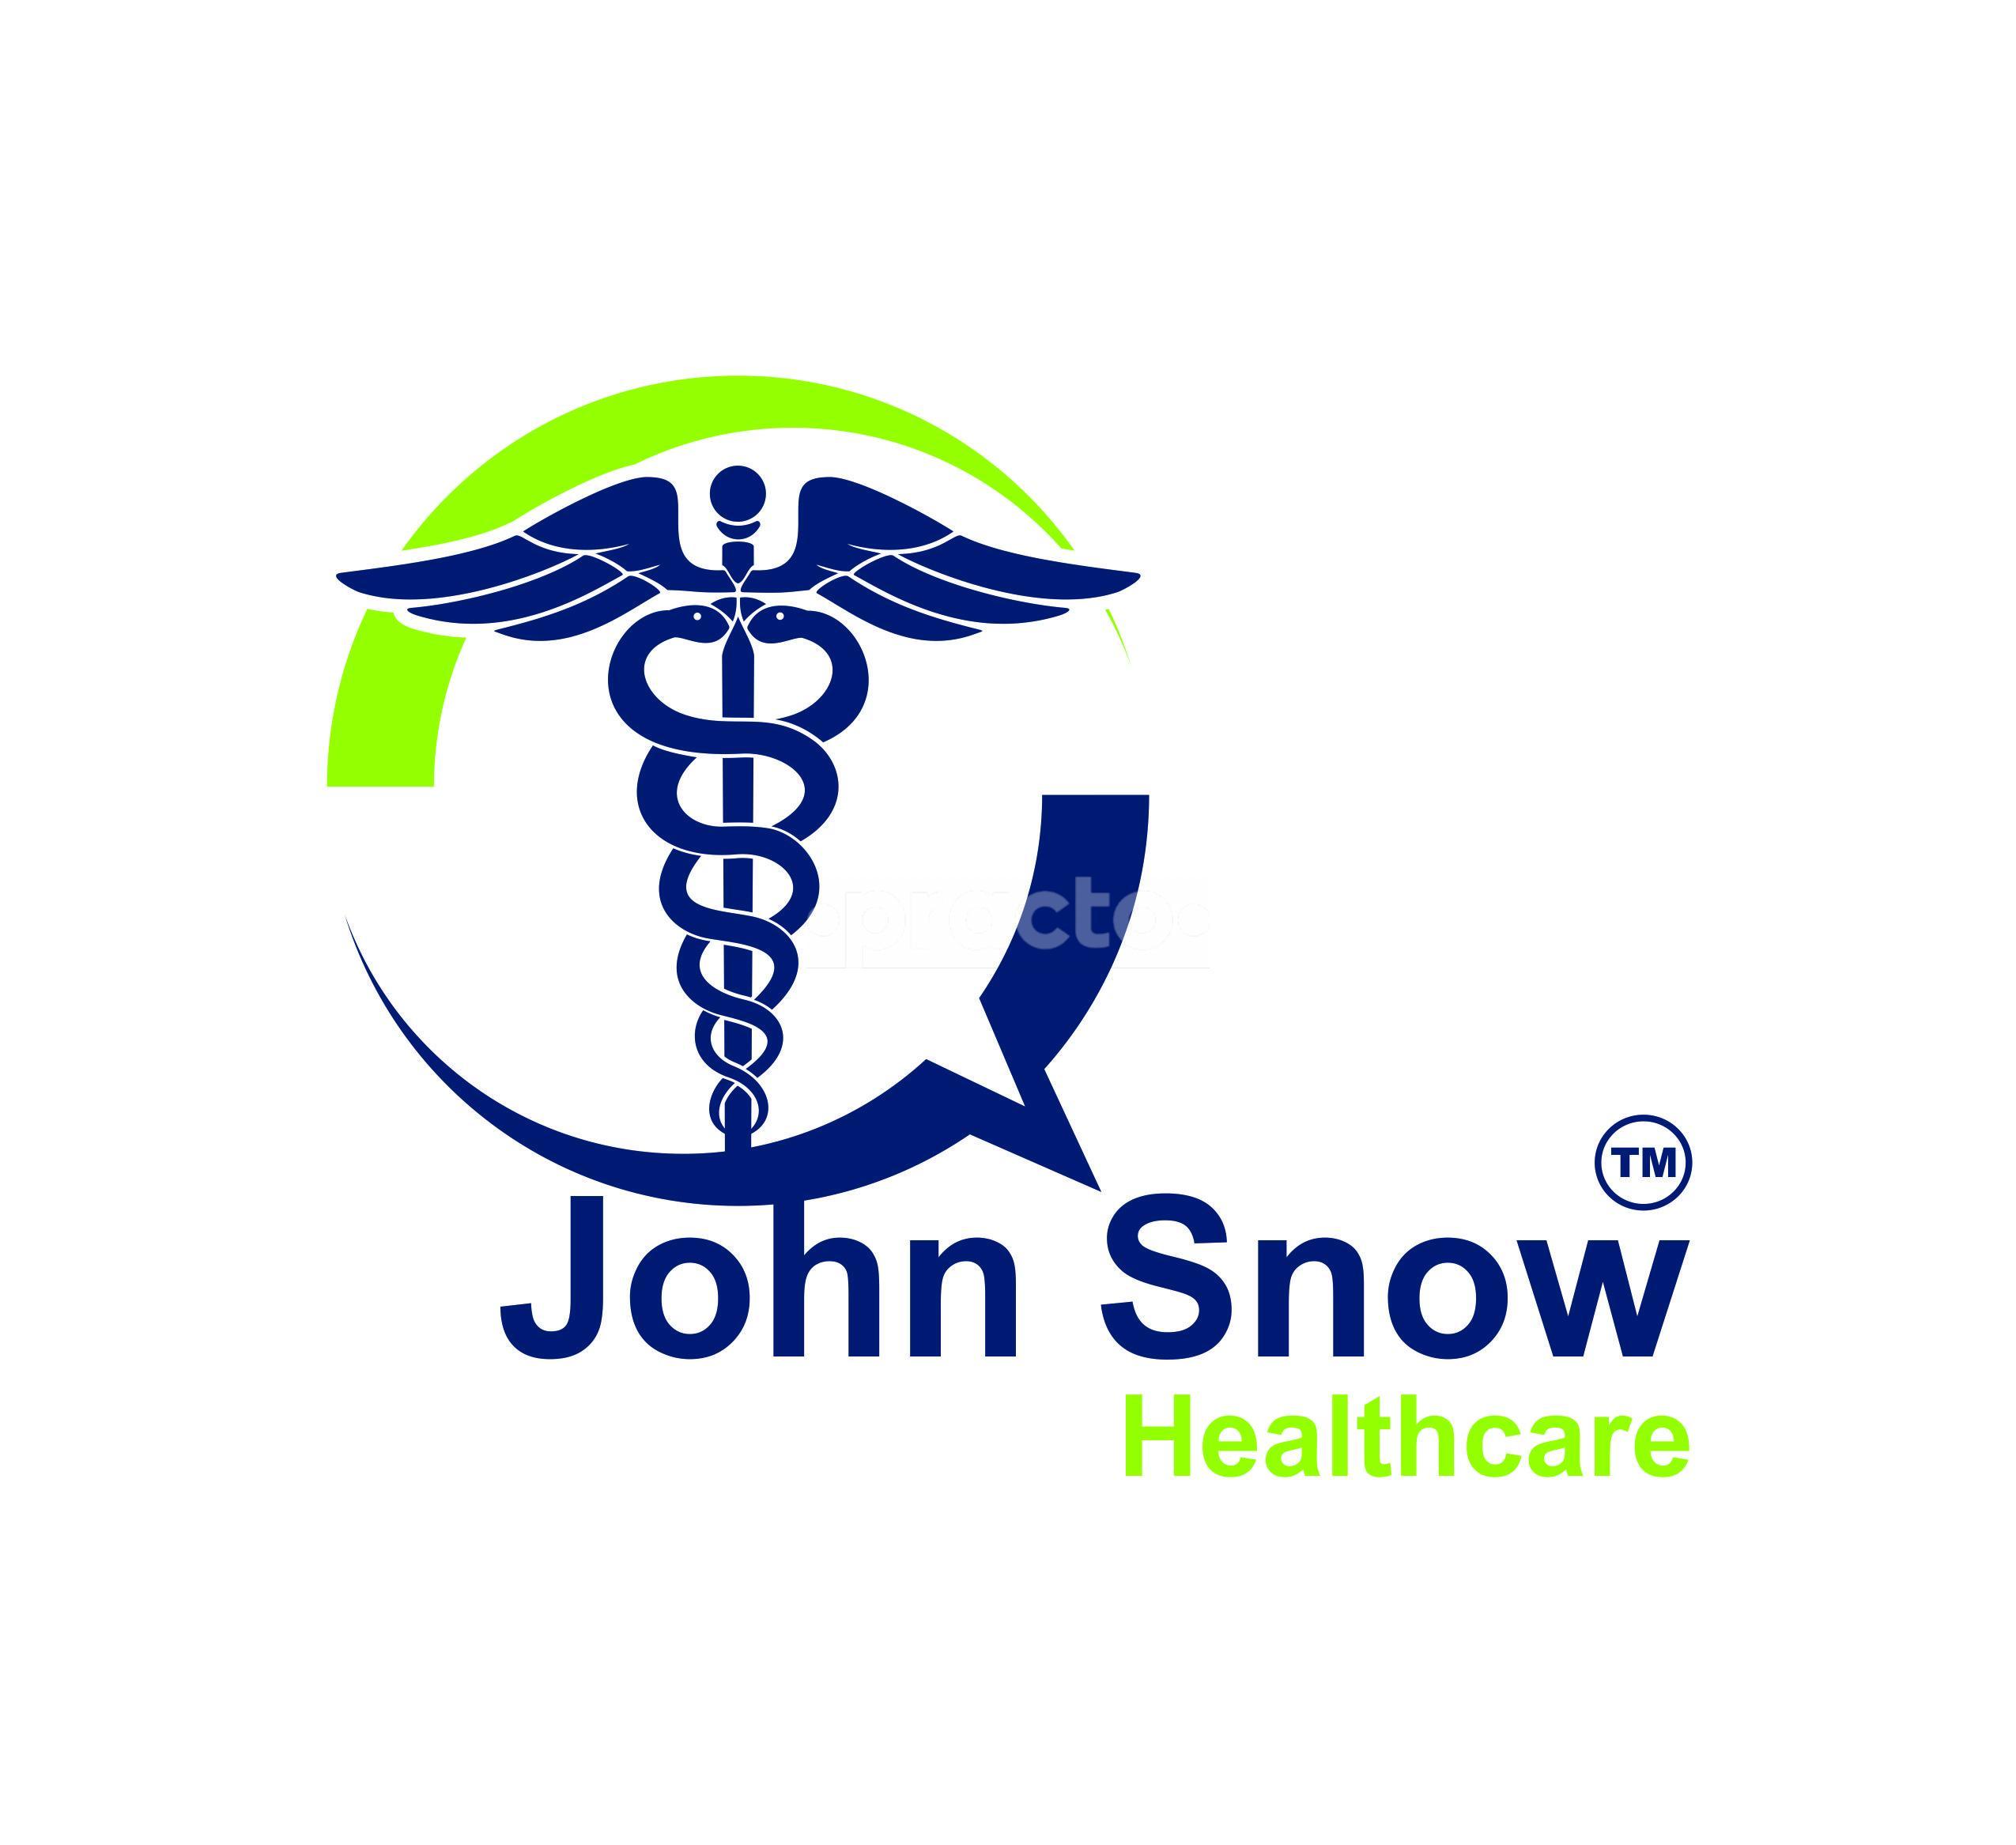 John Snow Healthcare